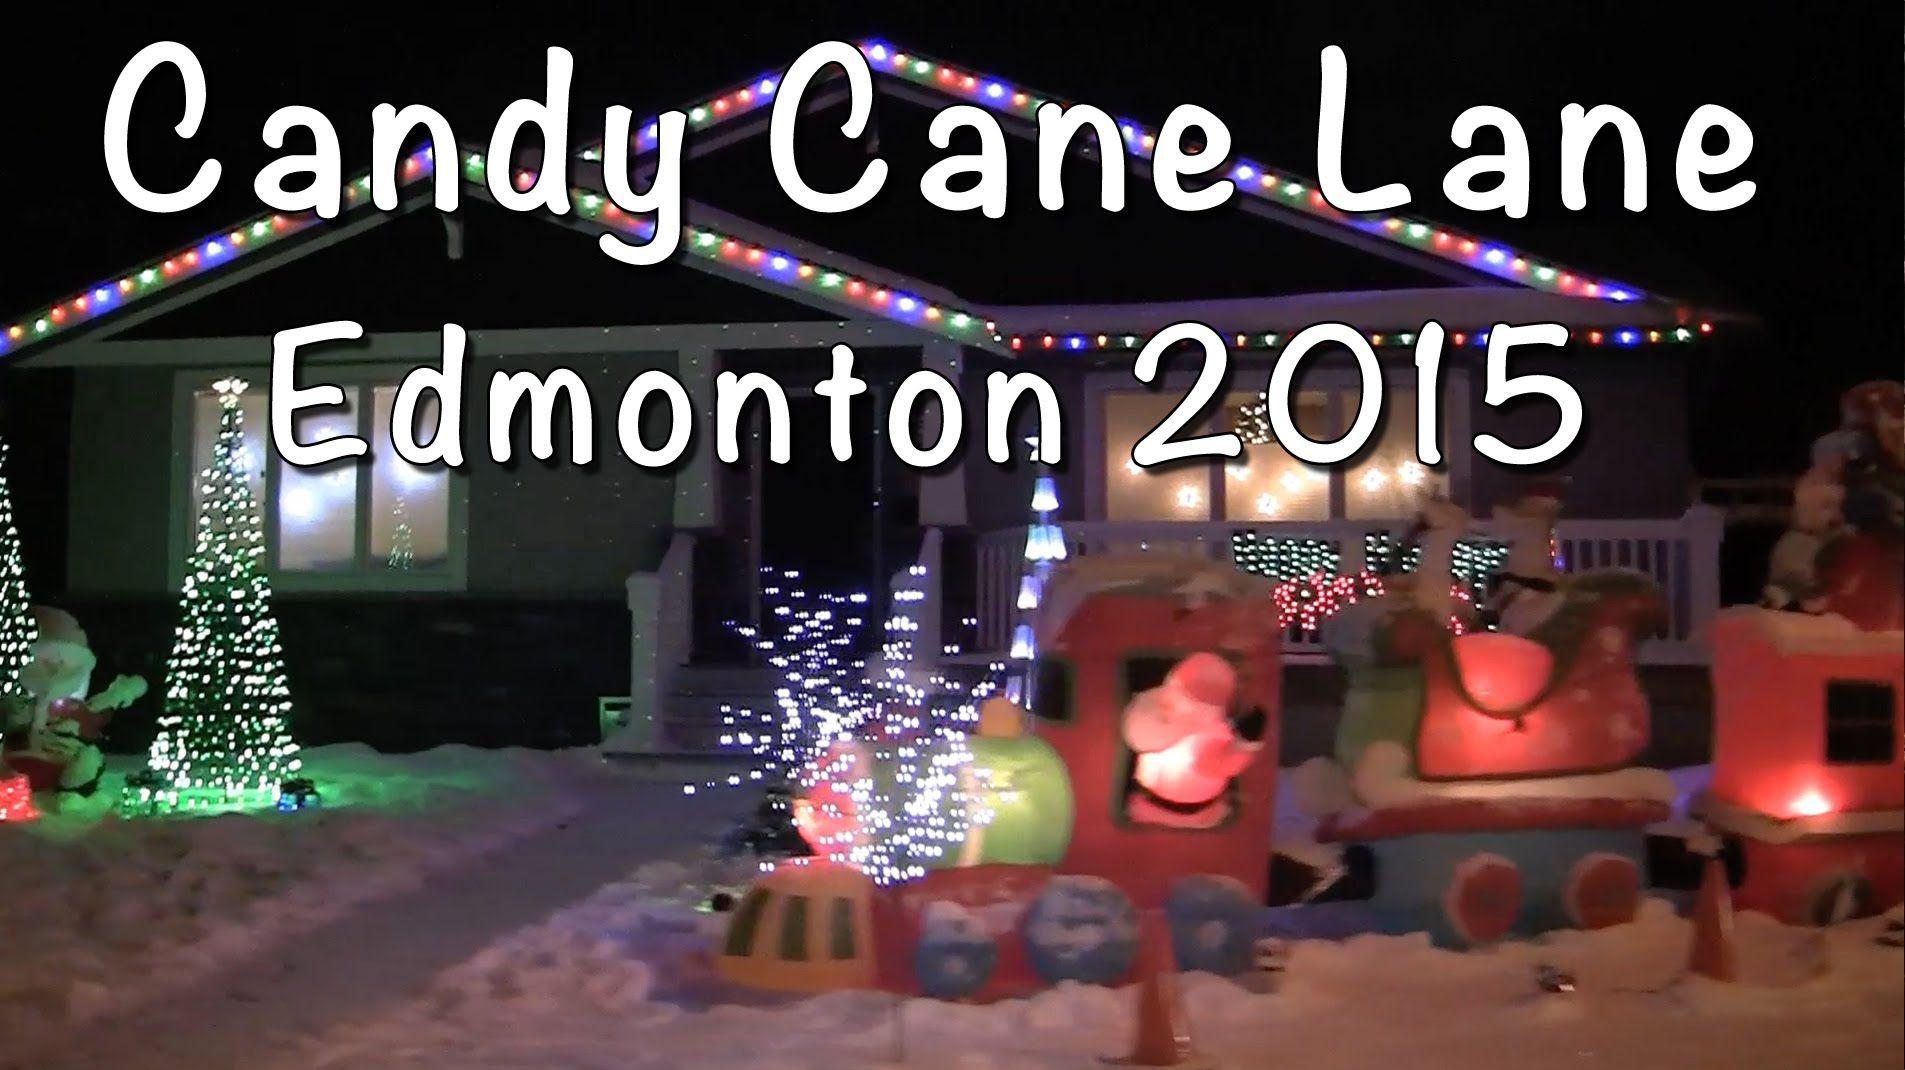 Candy Cane Lane 2015, in Edmonton, AB. Published on Dec 19